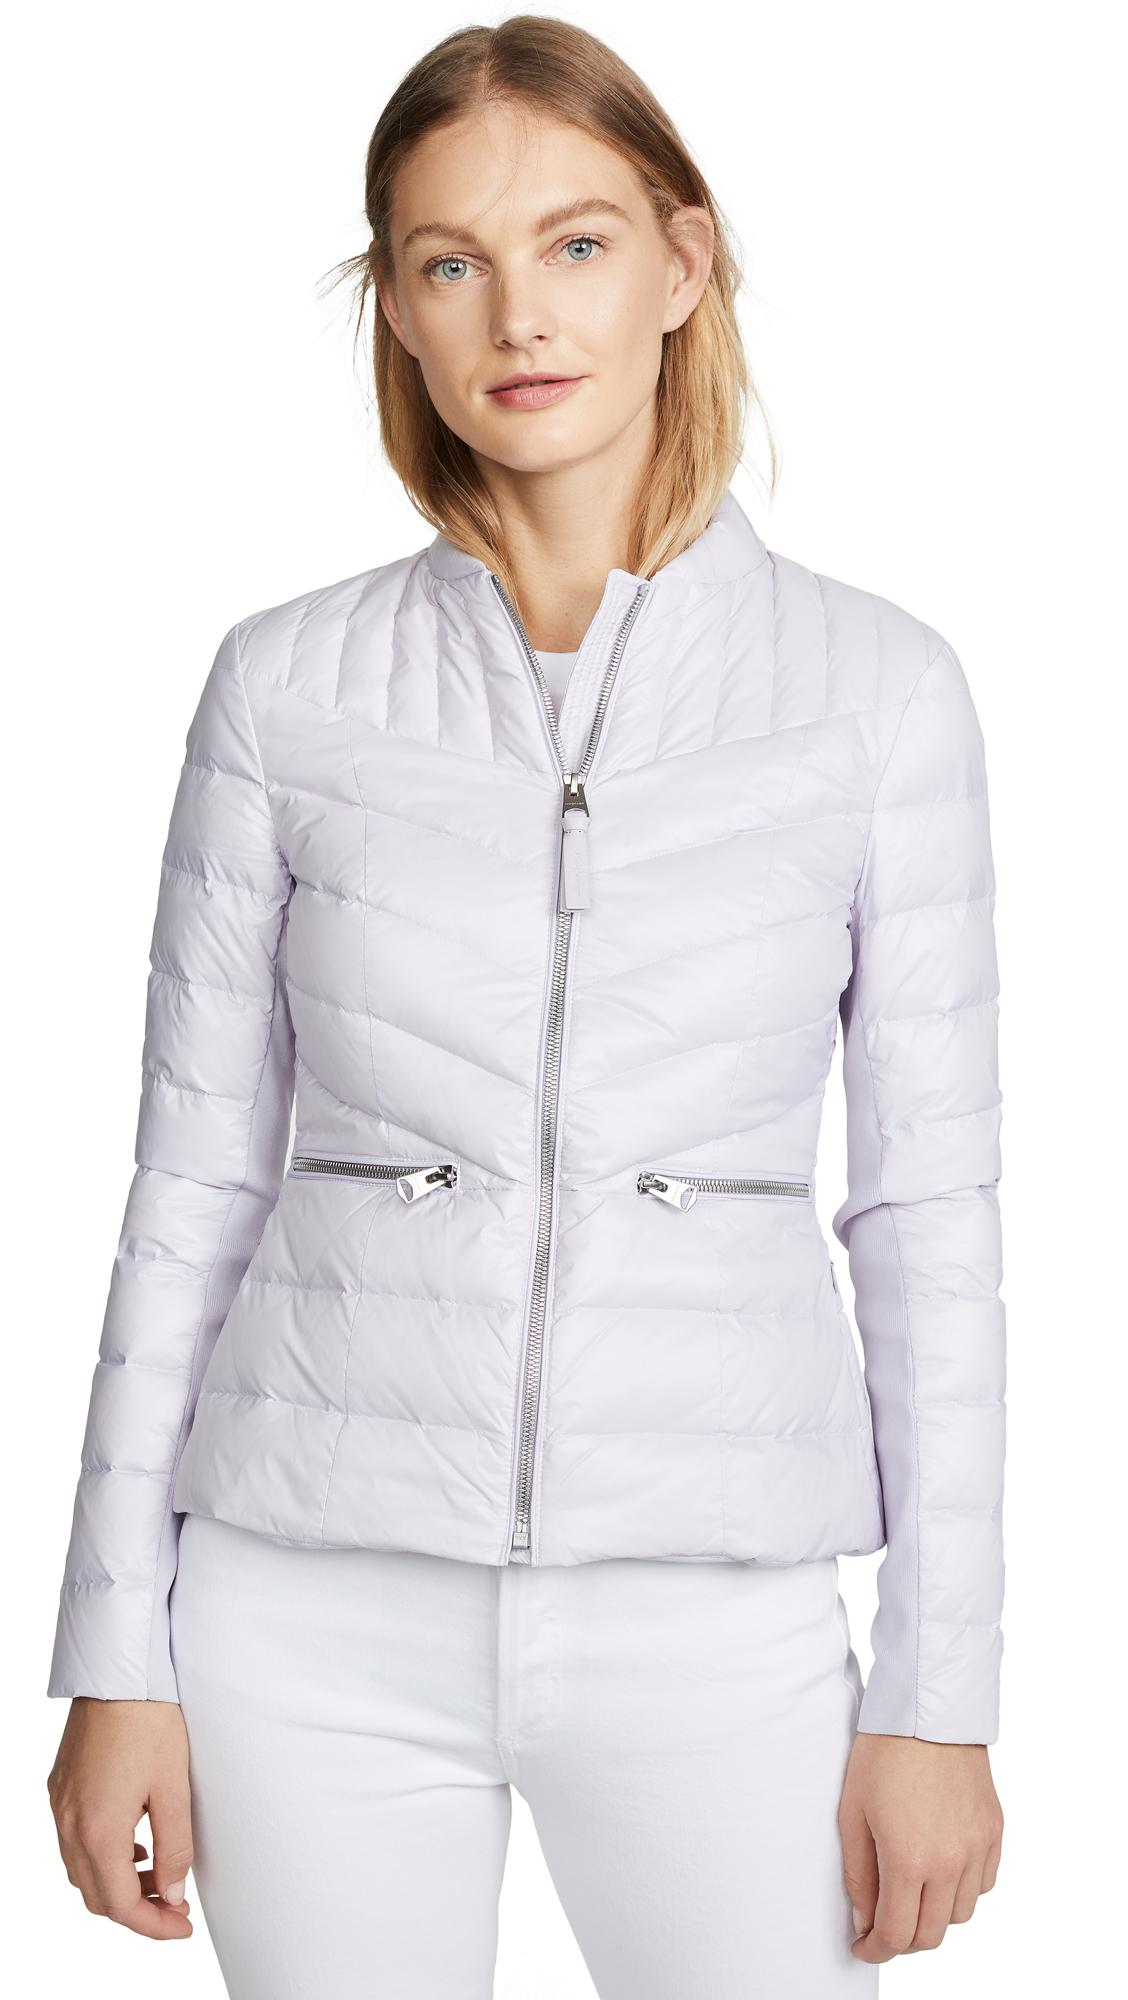 Mackage Petra Puffer Jacket - Lilac